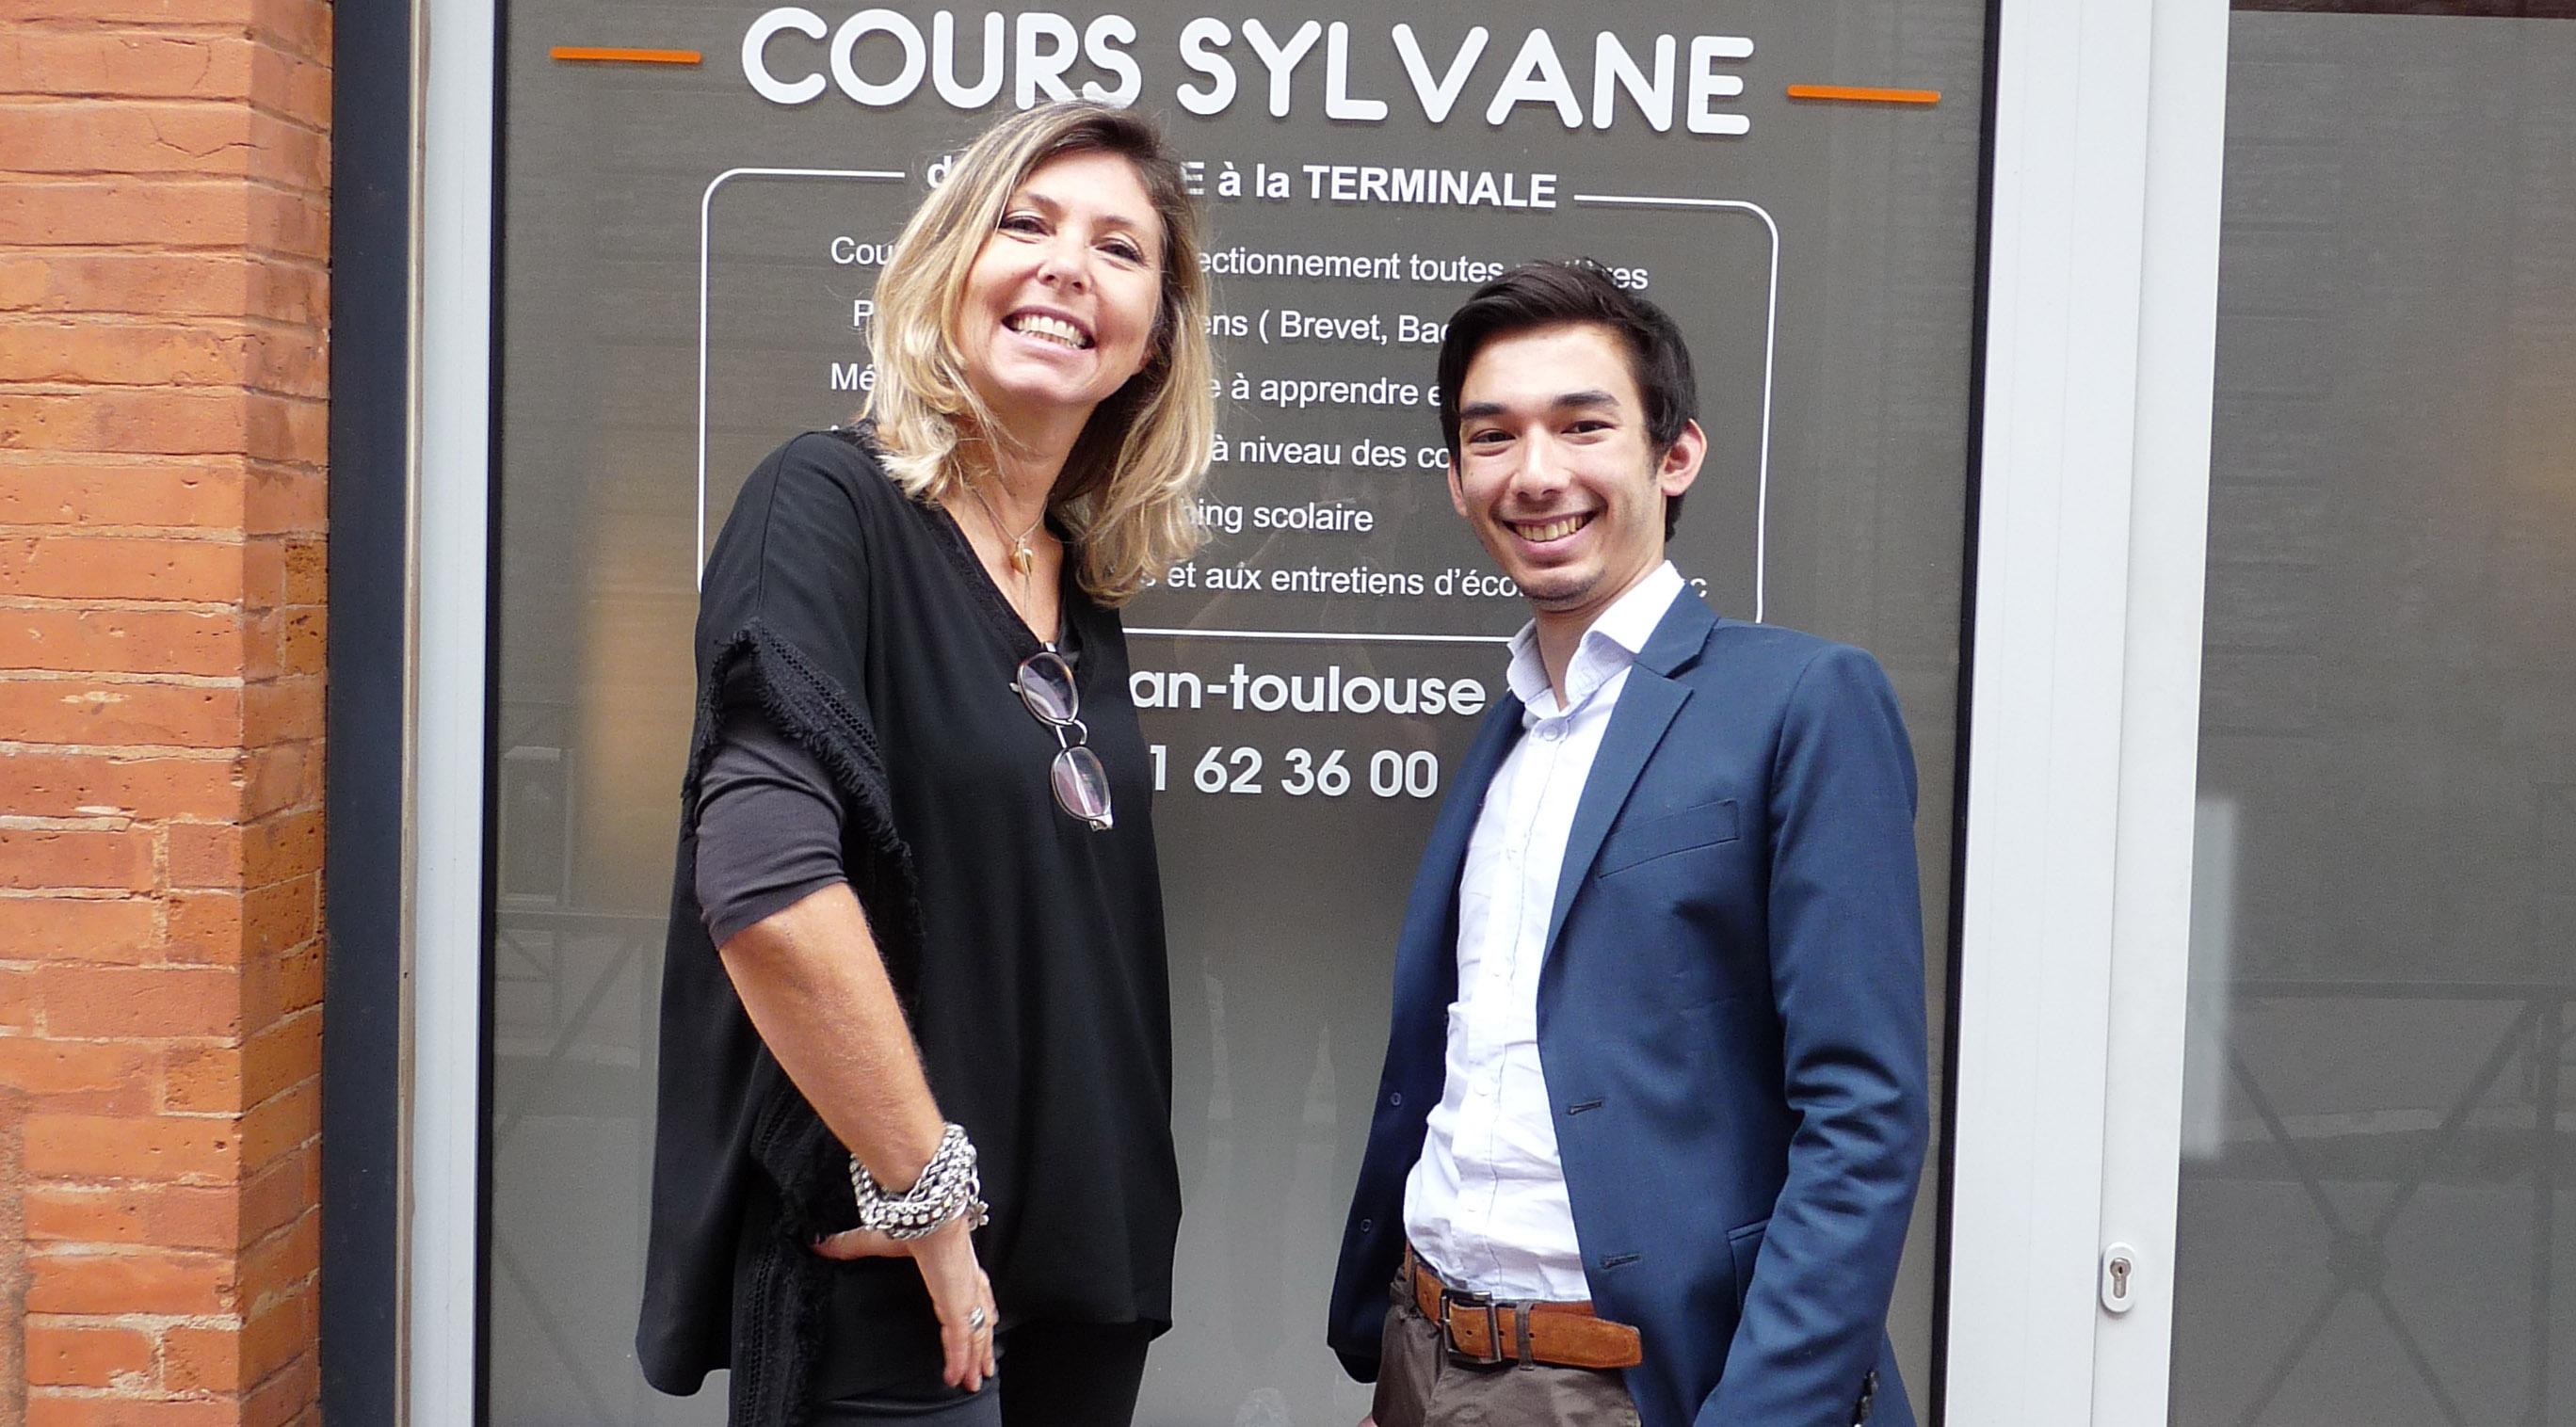 Cours Sylvane Toulouse